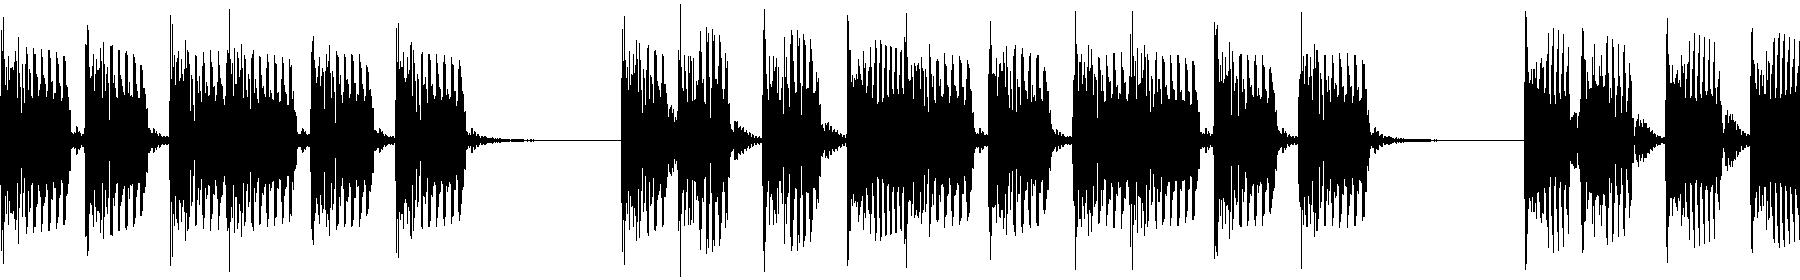 vedh melodyloop 020 bm 124bpm